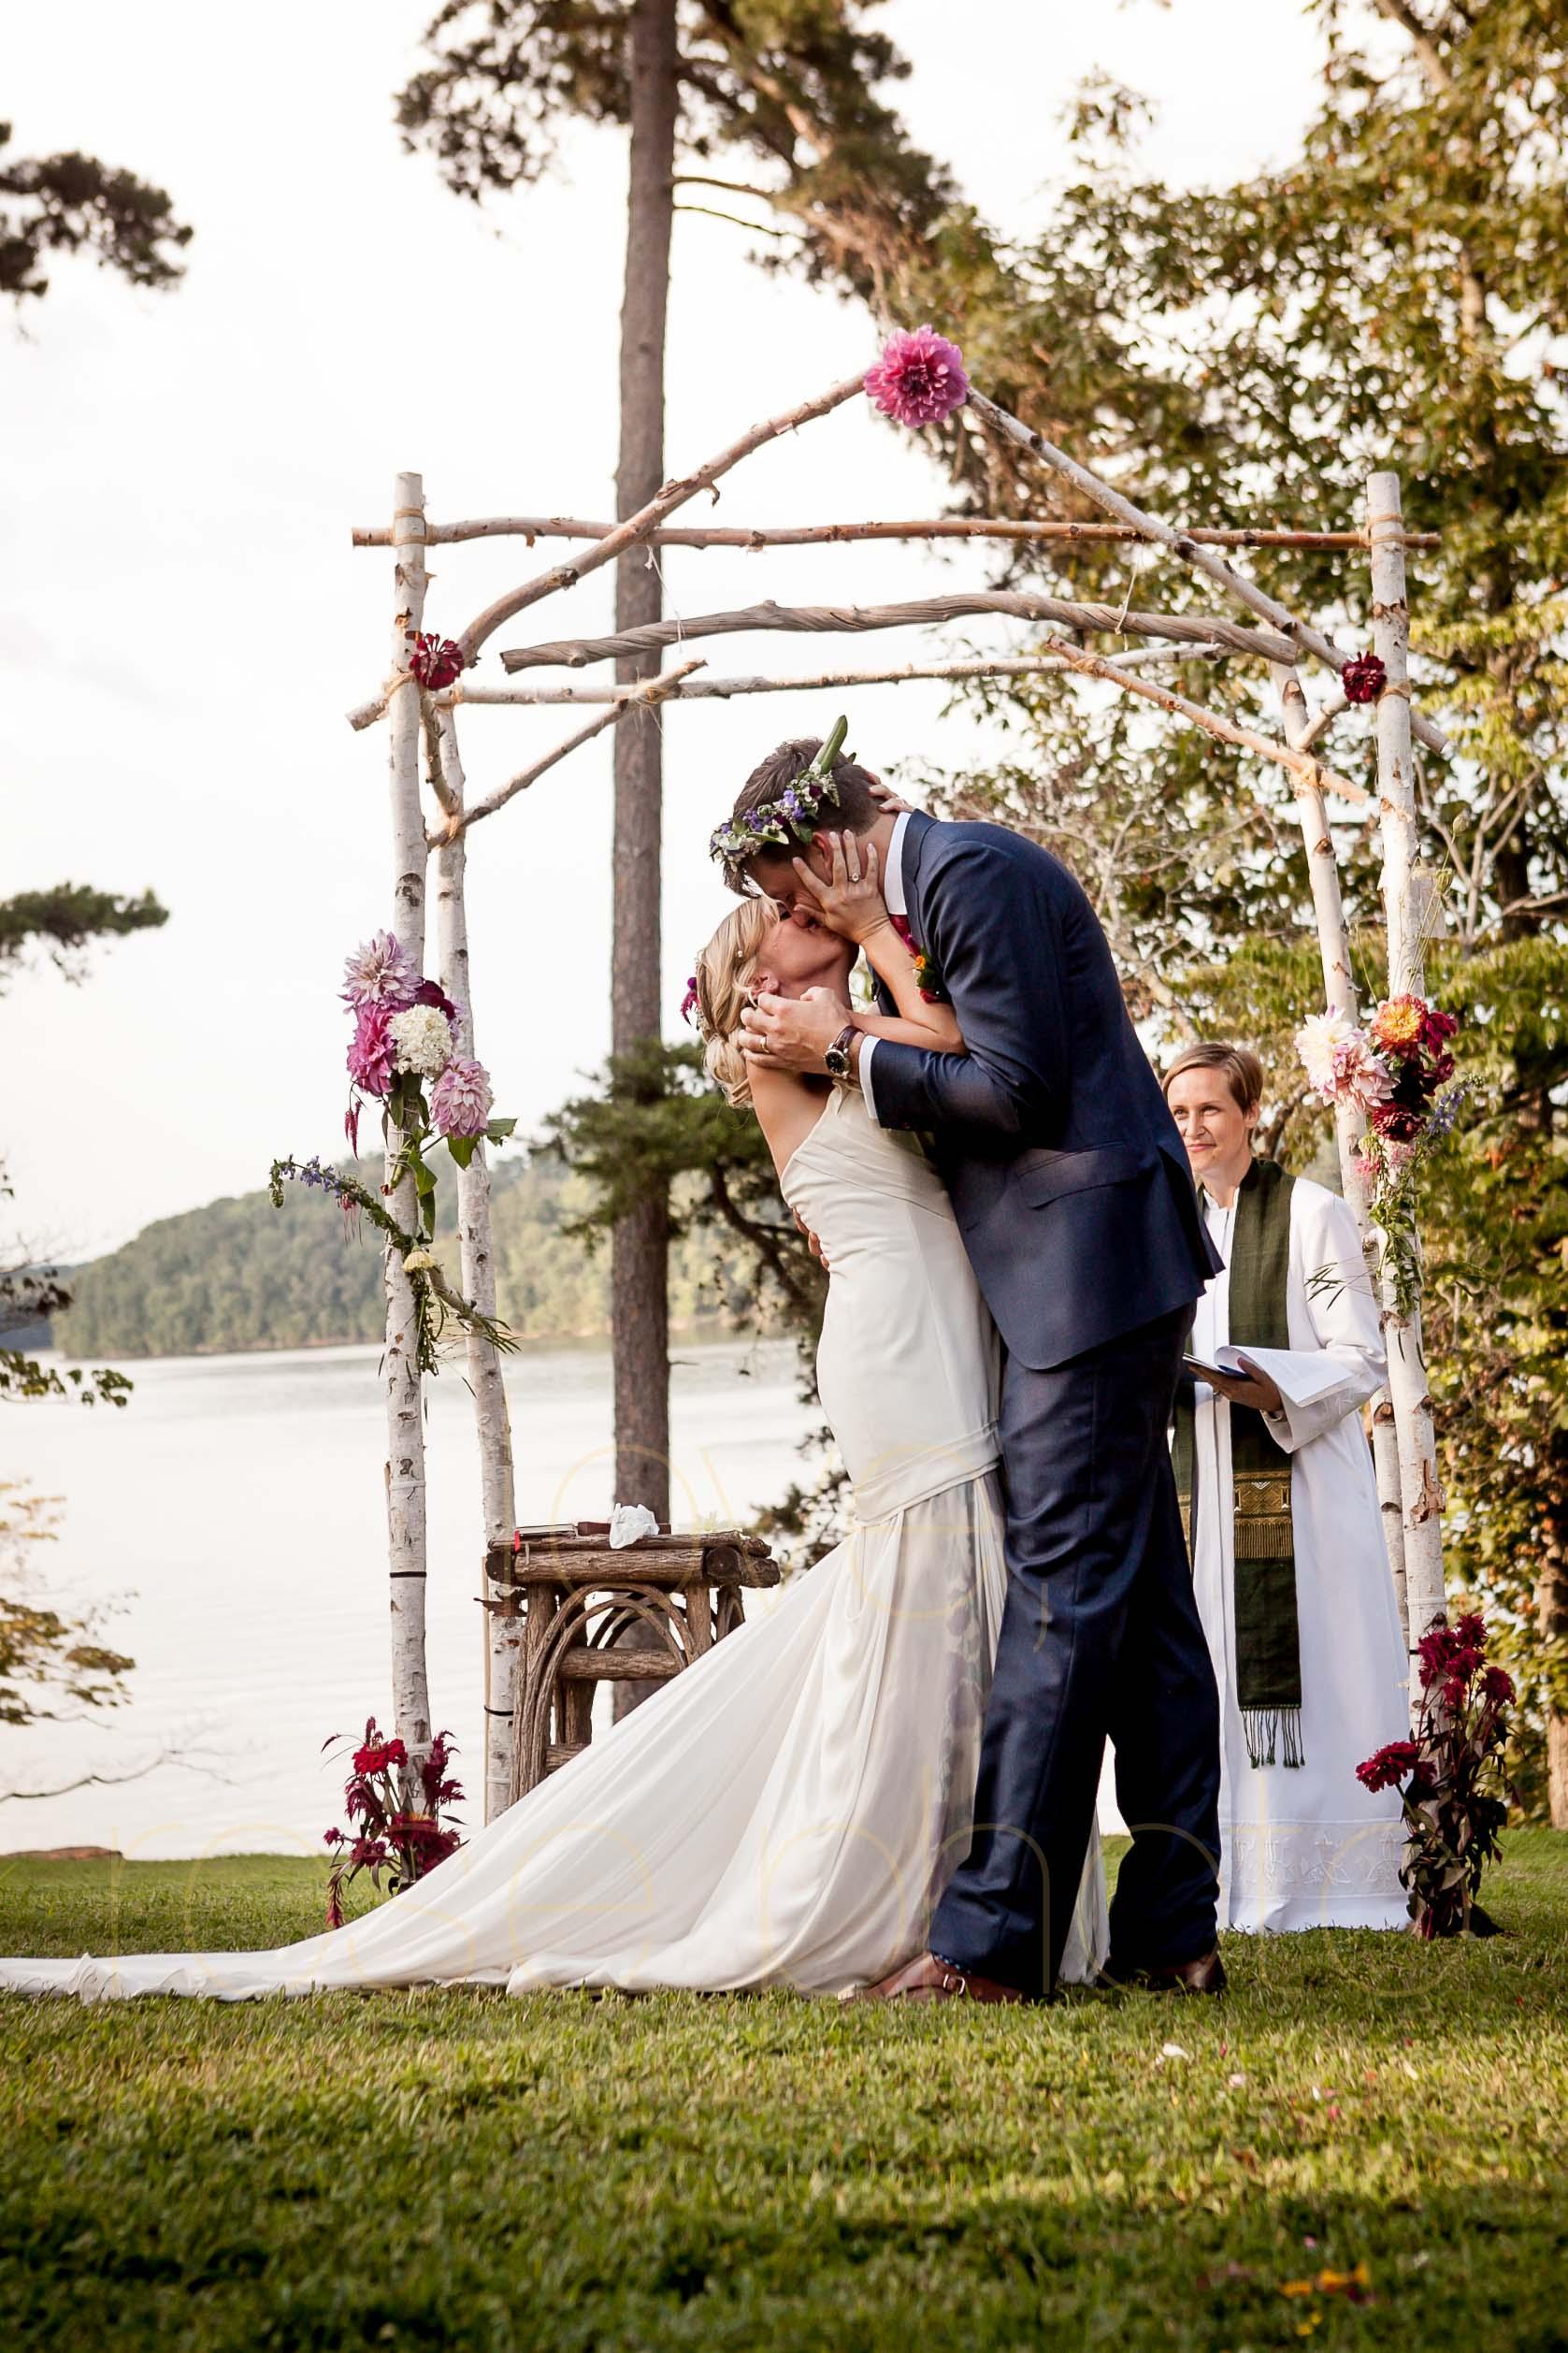 Rose Photo Asheville Wedding Photographer Nasheville Weddings Charleston Bride Chicago photojournalist weddings -42.jpg